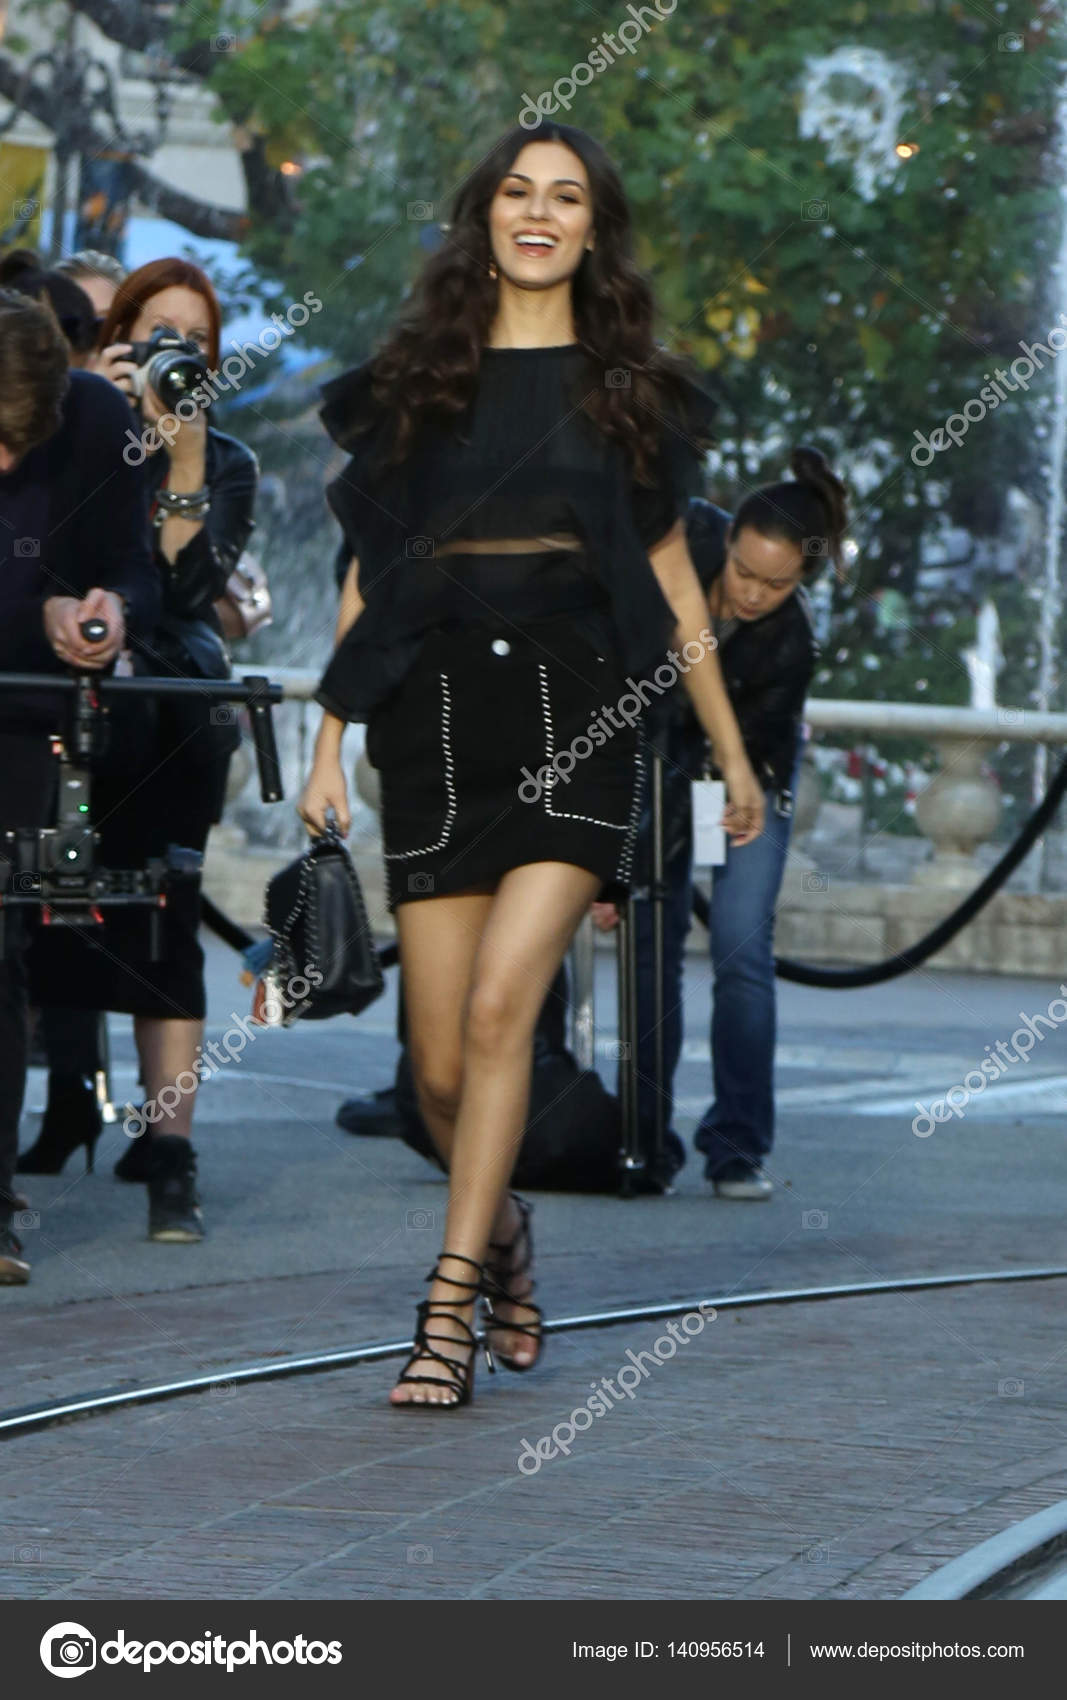 5f4112bad7aa64 American actress Victoria Justice – Stock Editorial Photo © s bukley ...